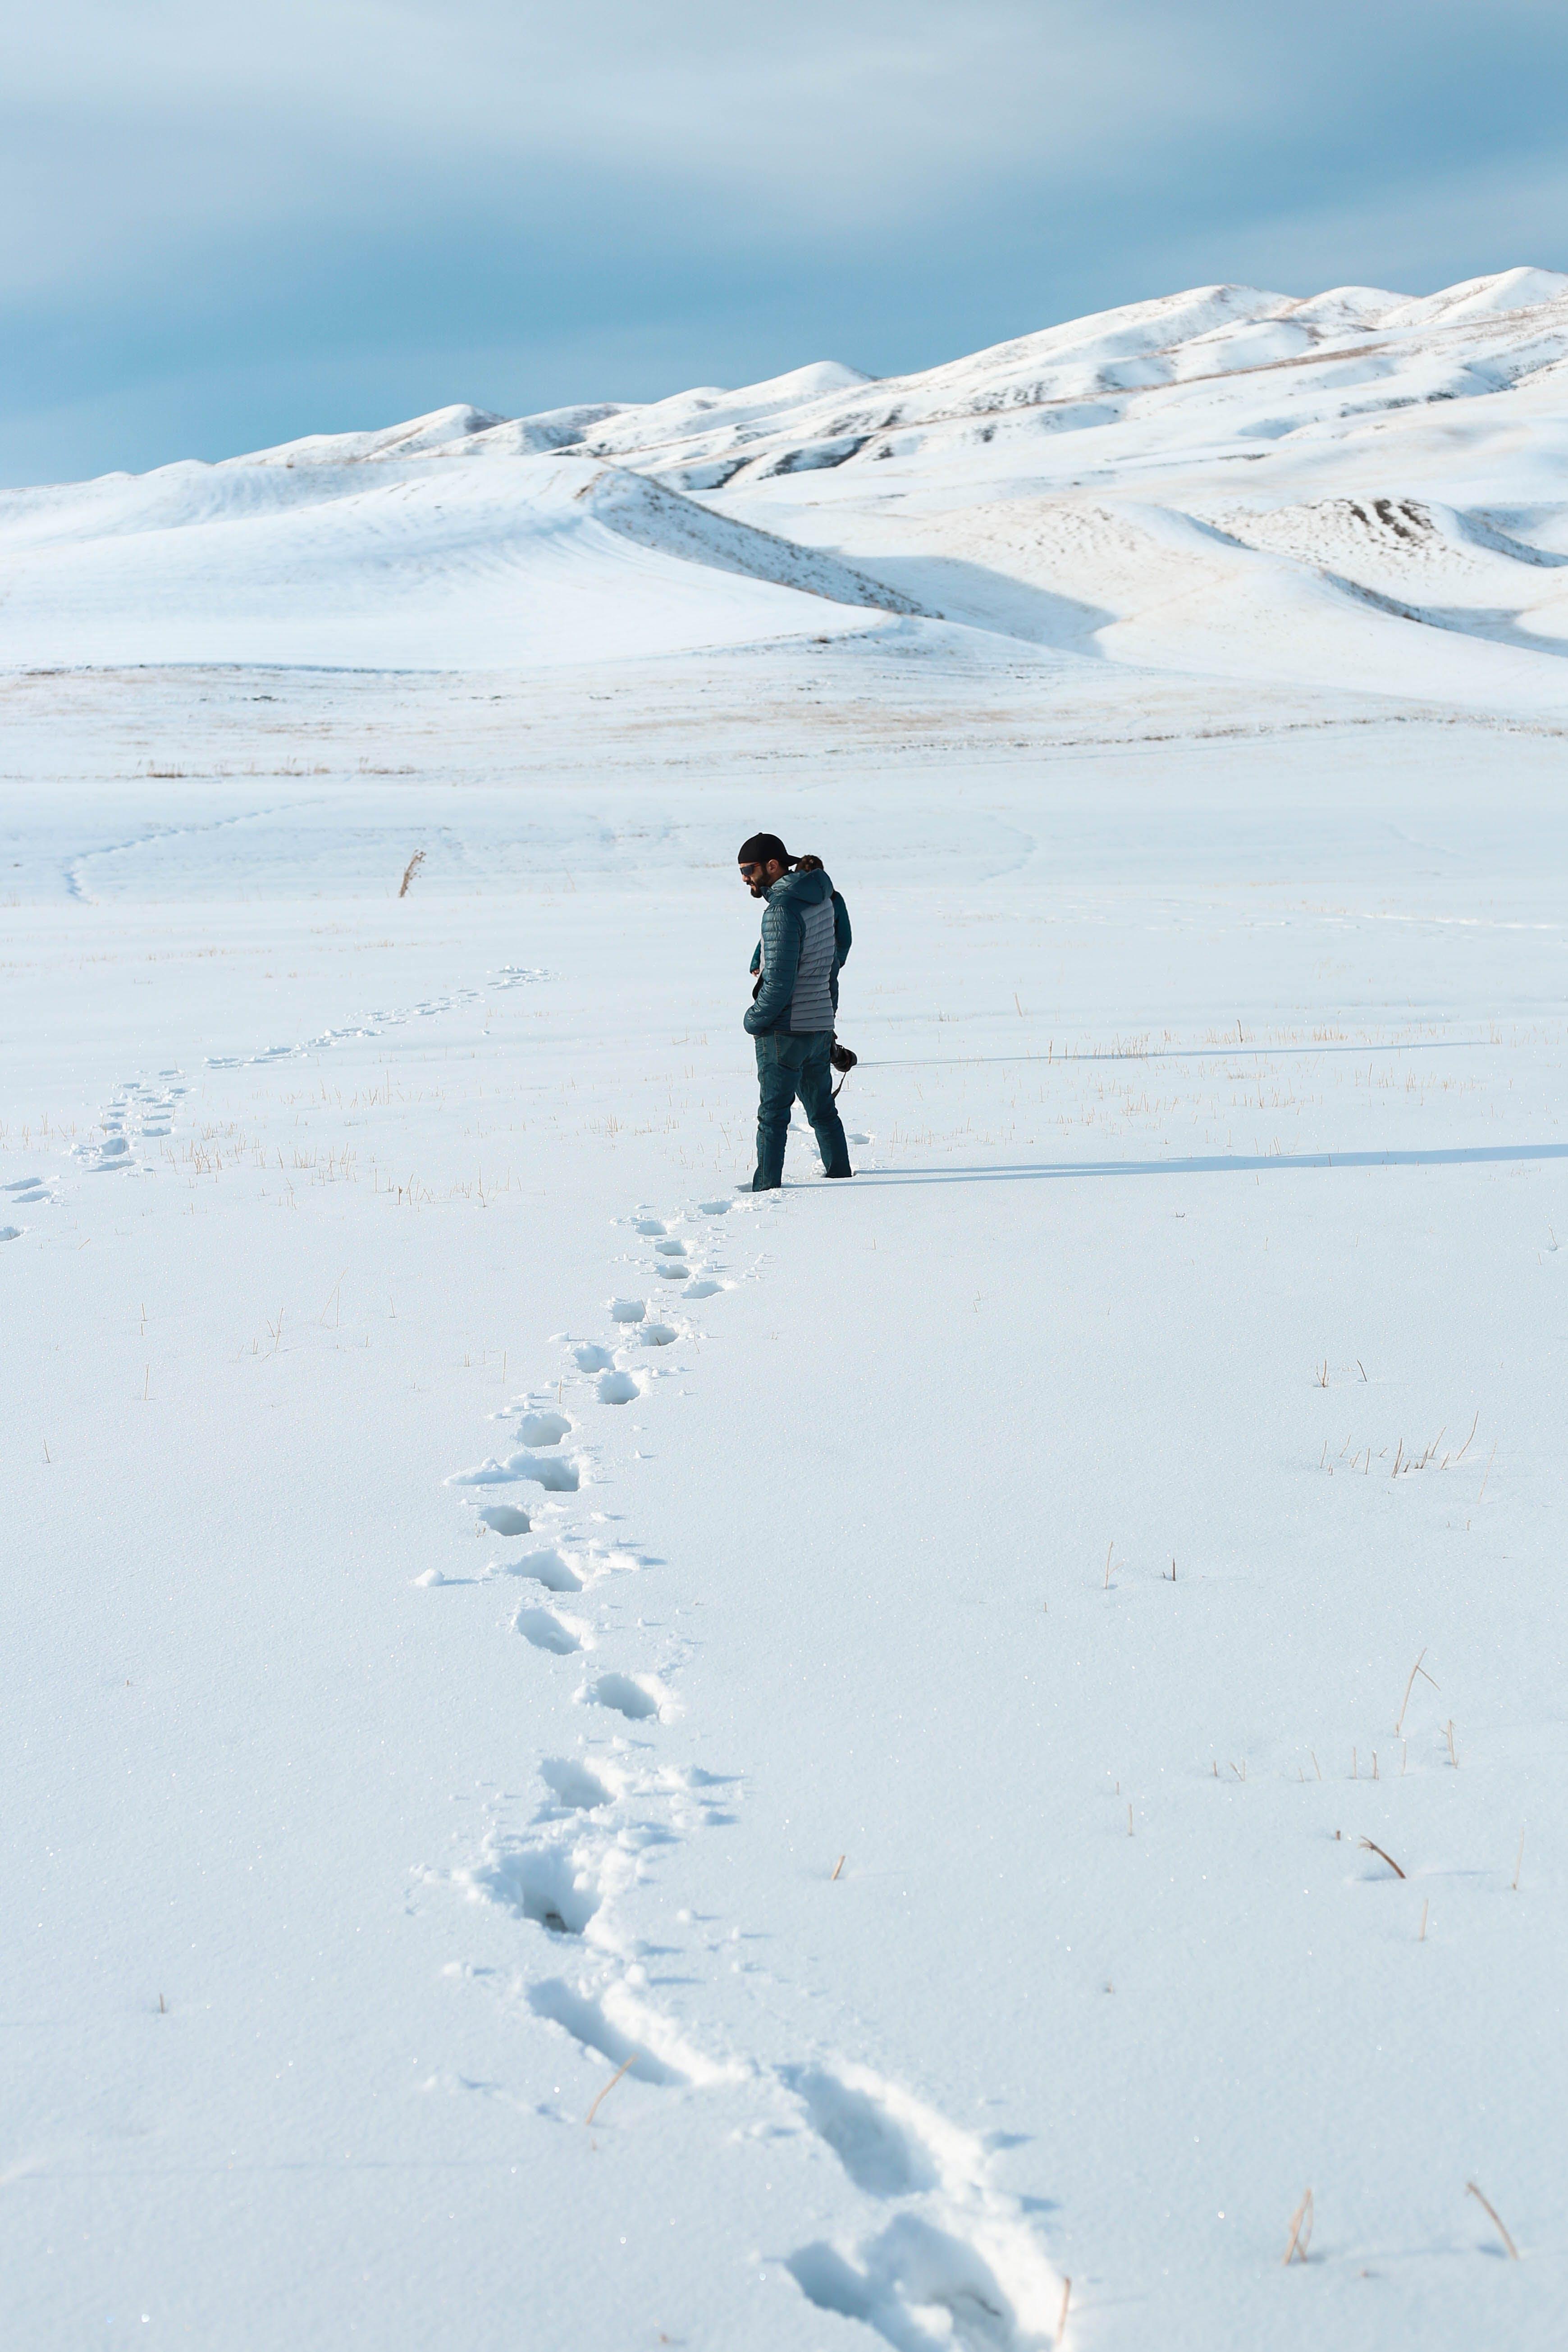 Man Standing on Snow Area